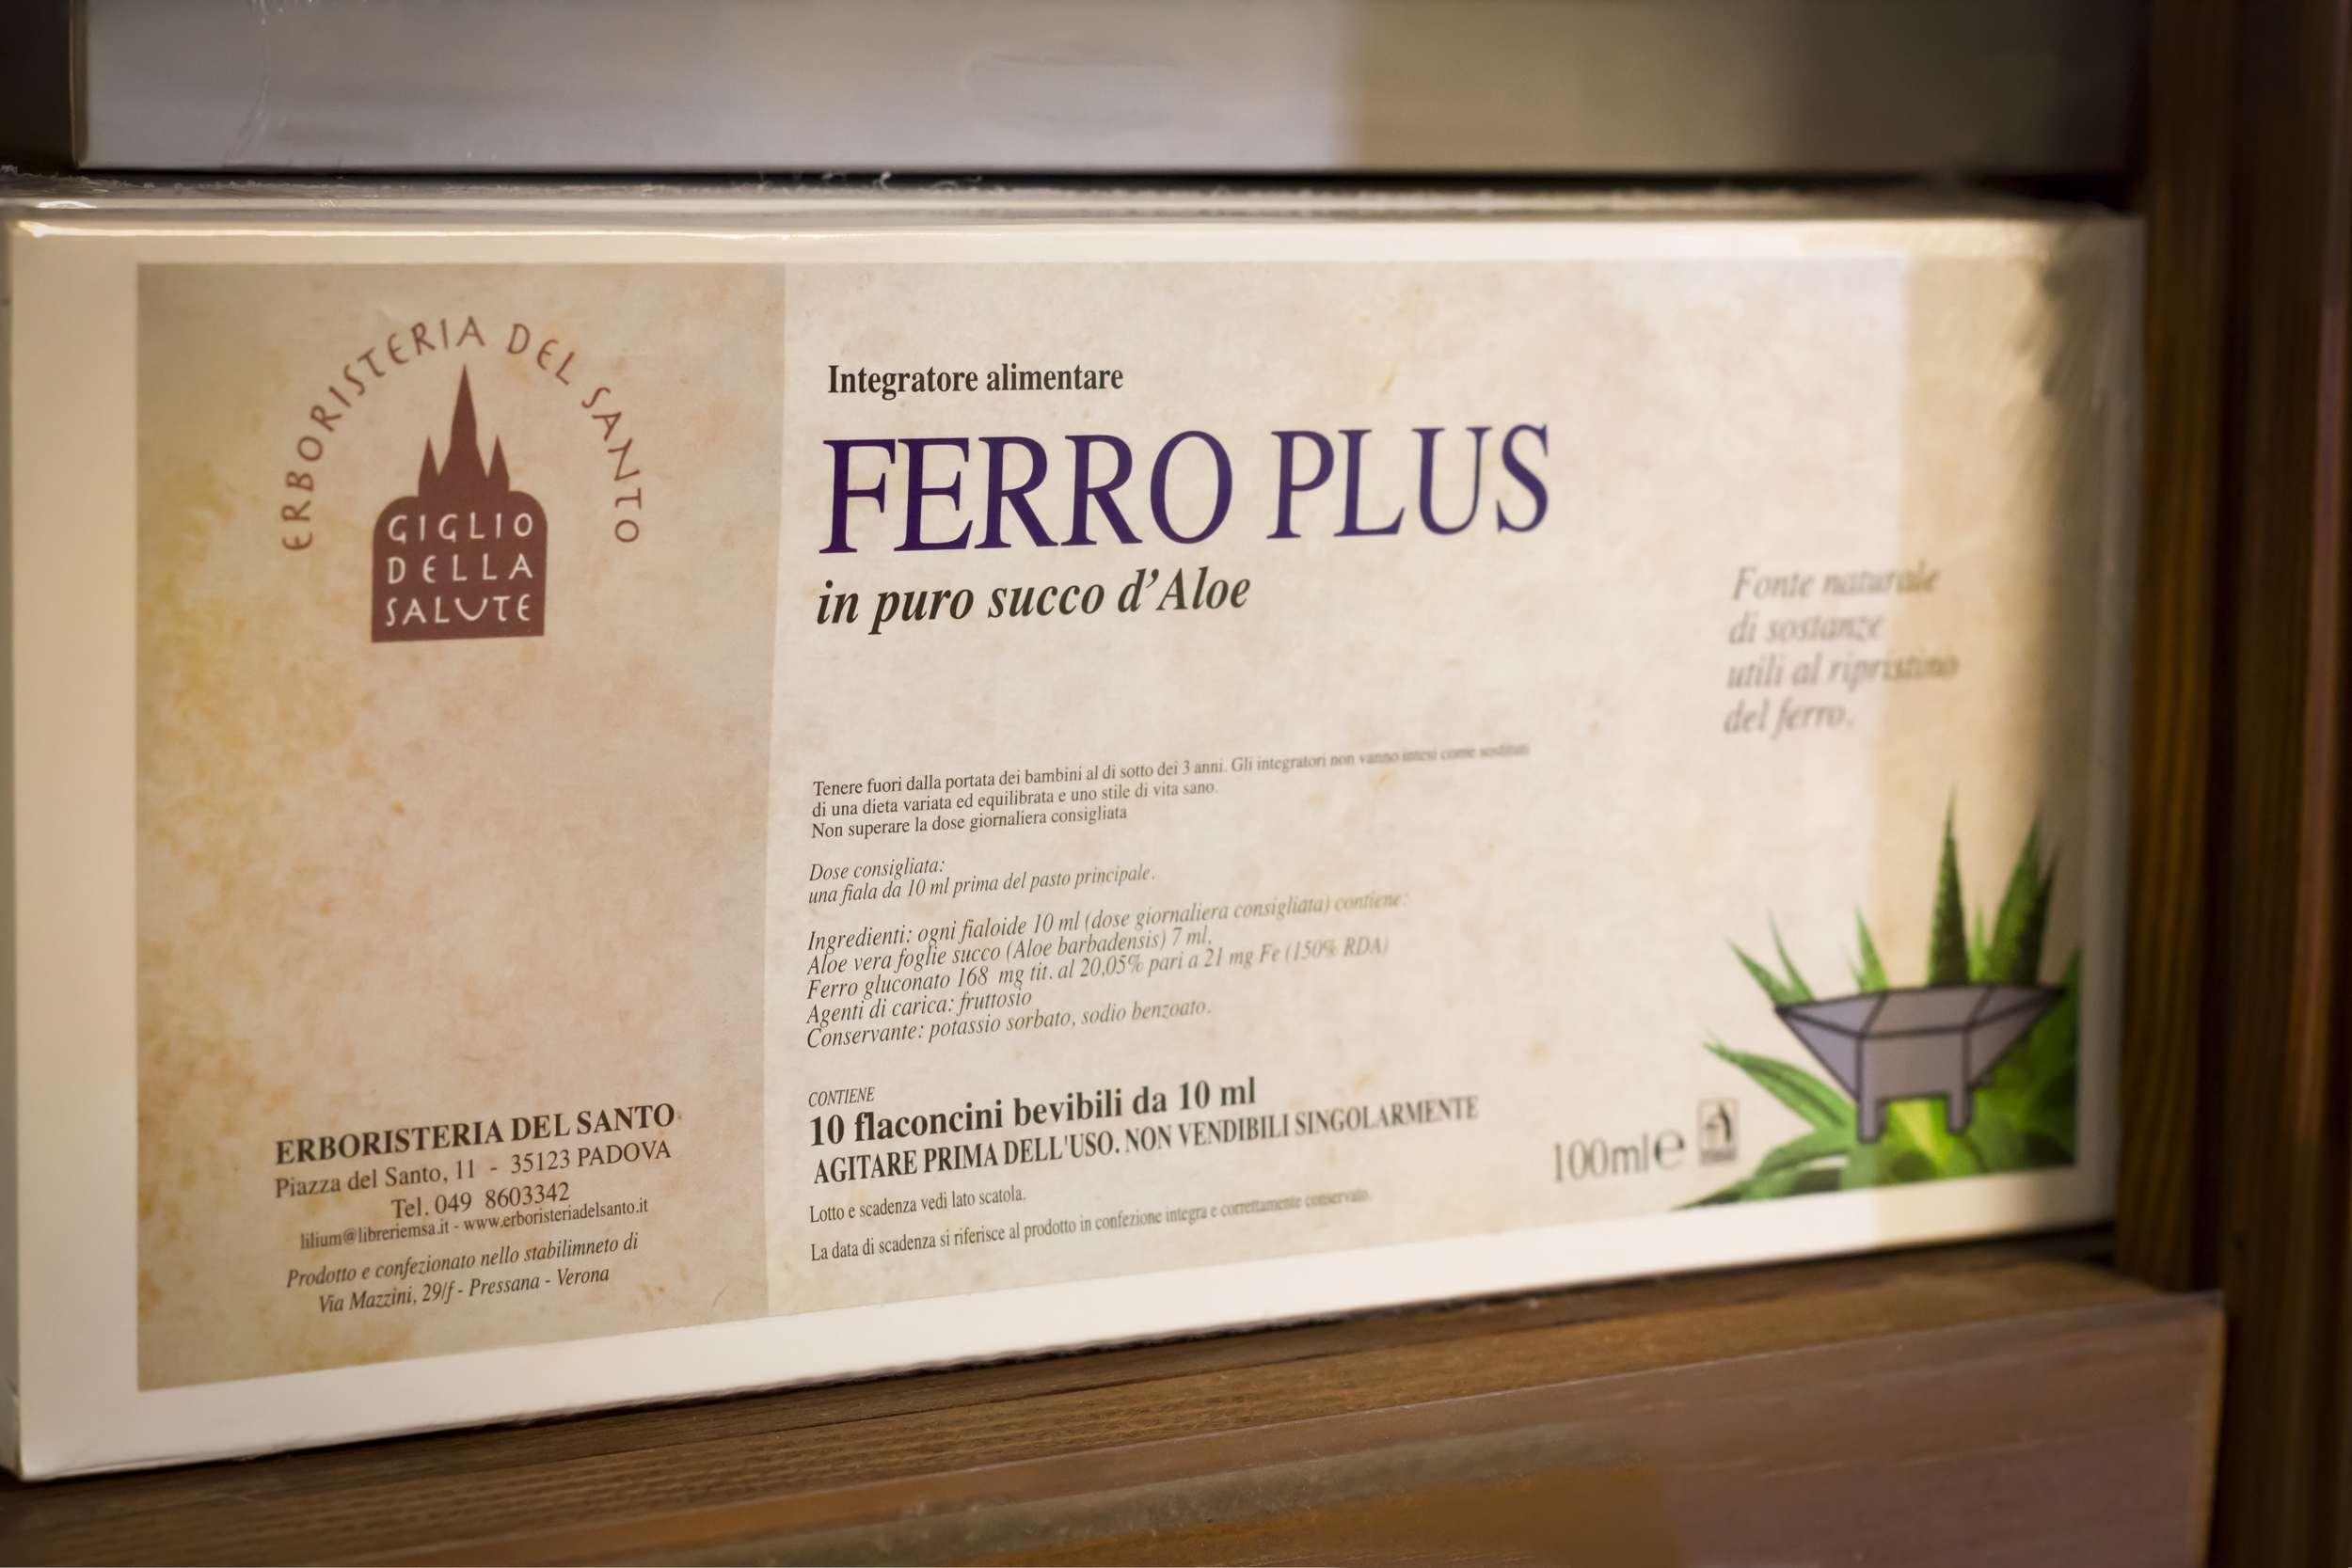 <p><strong>Integratori alimentari</strong><a href=http://www.libreriadelsanto.it/reparti/herborarium-del-santo/integratori-alimentari/3575.html>Scopri di più →</a></p>